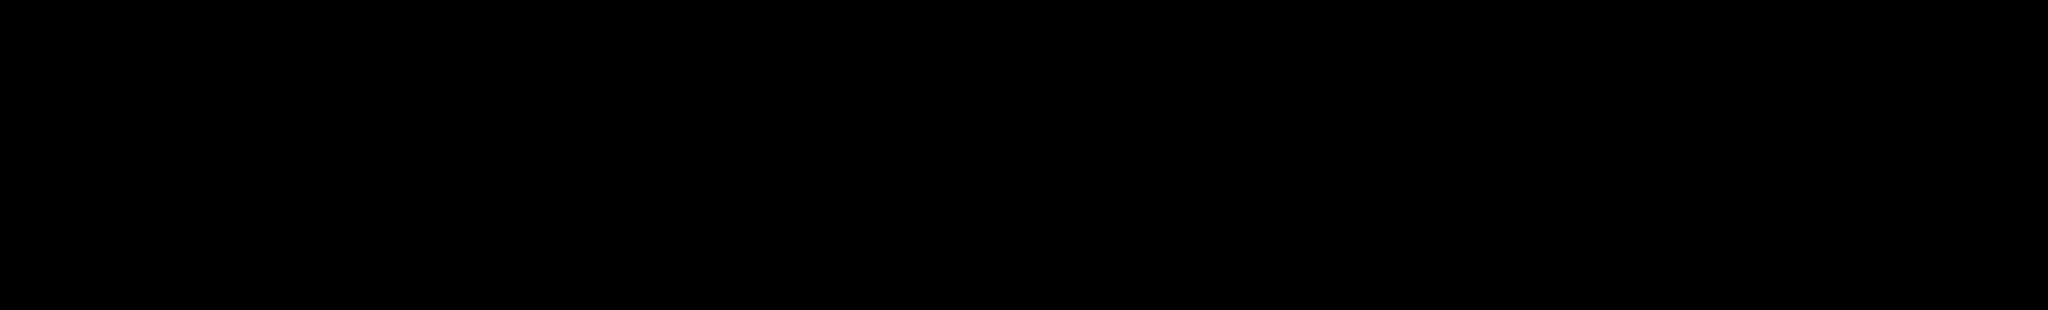 Kairos Fortuna